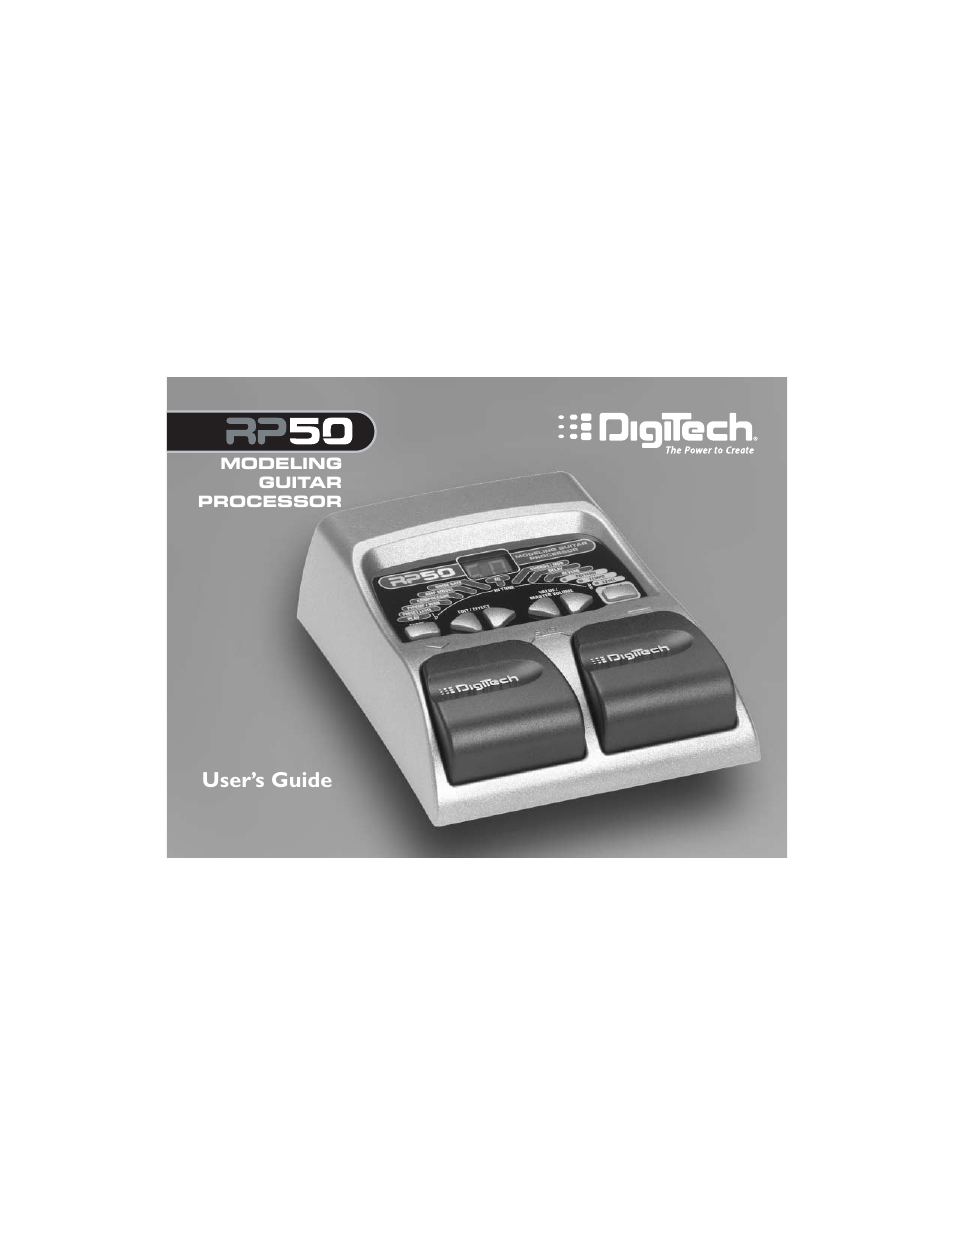 digitech rp50 user manual 28 pages rh manualsdir com pedal digitech rp50 manual pedal digitech rp50 manual